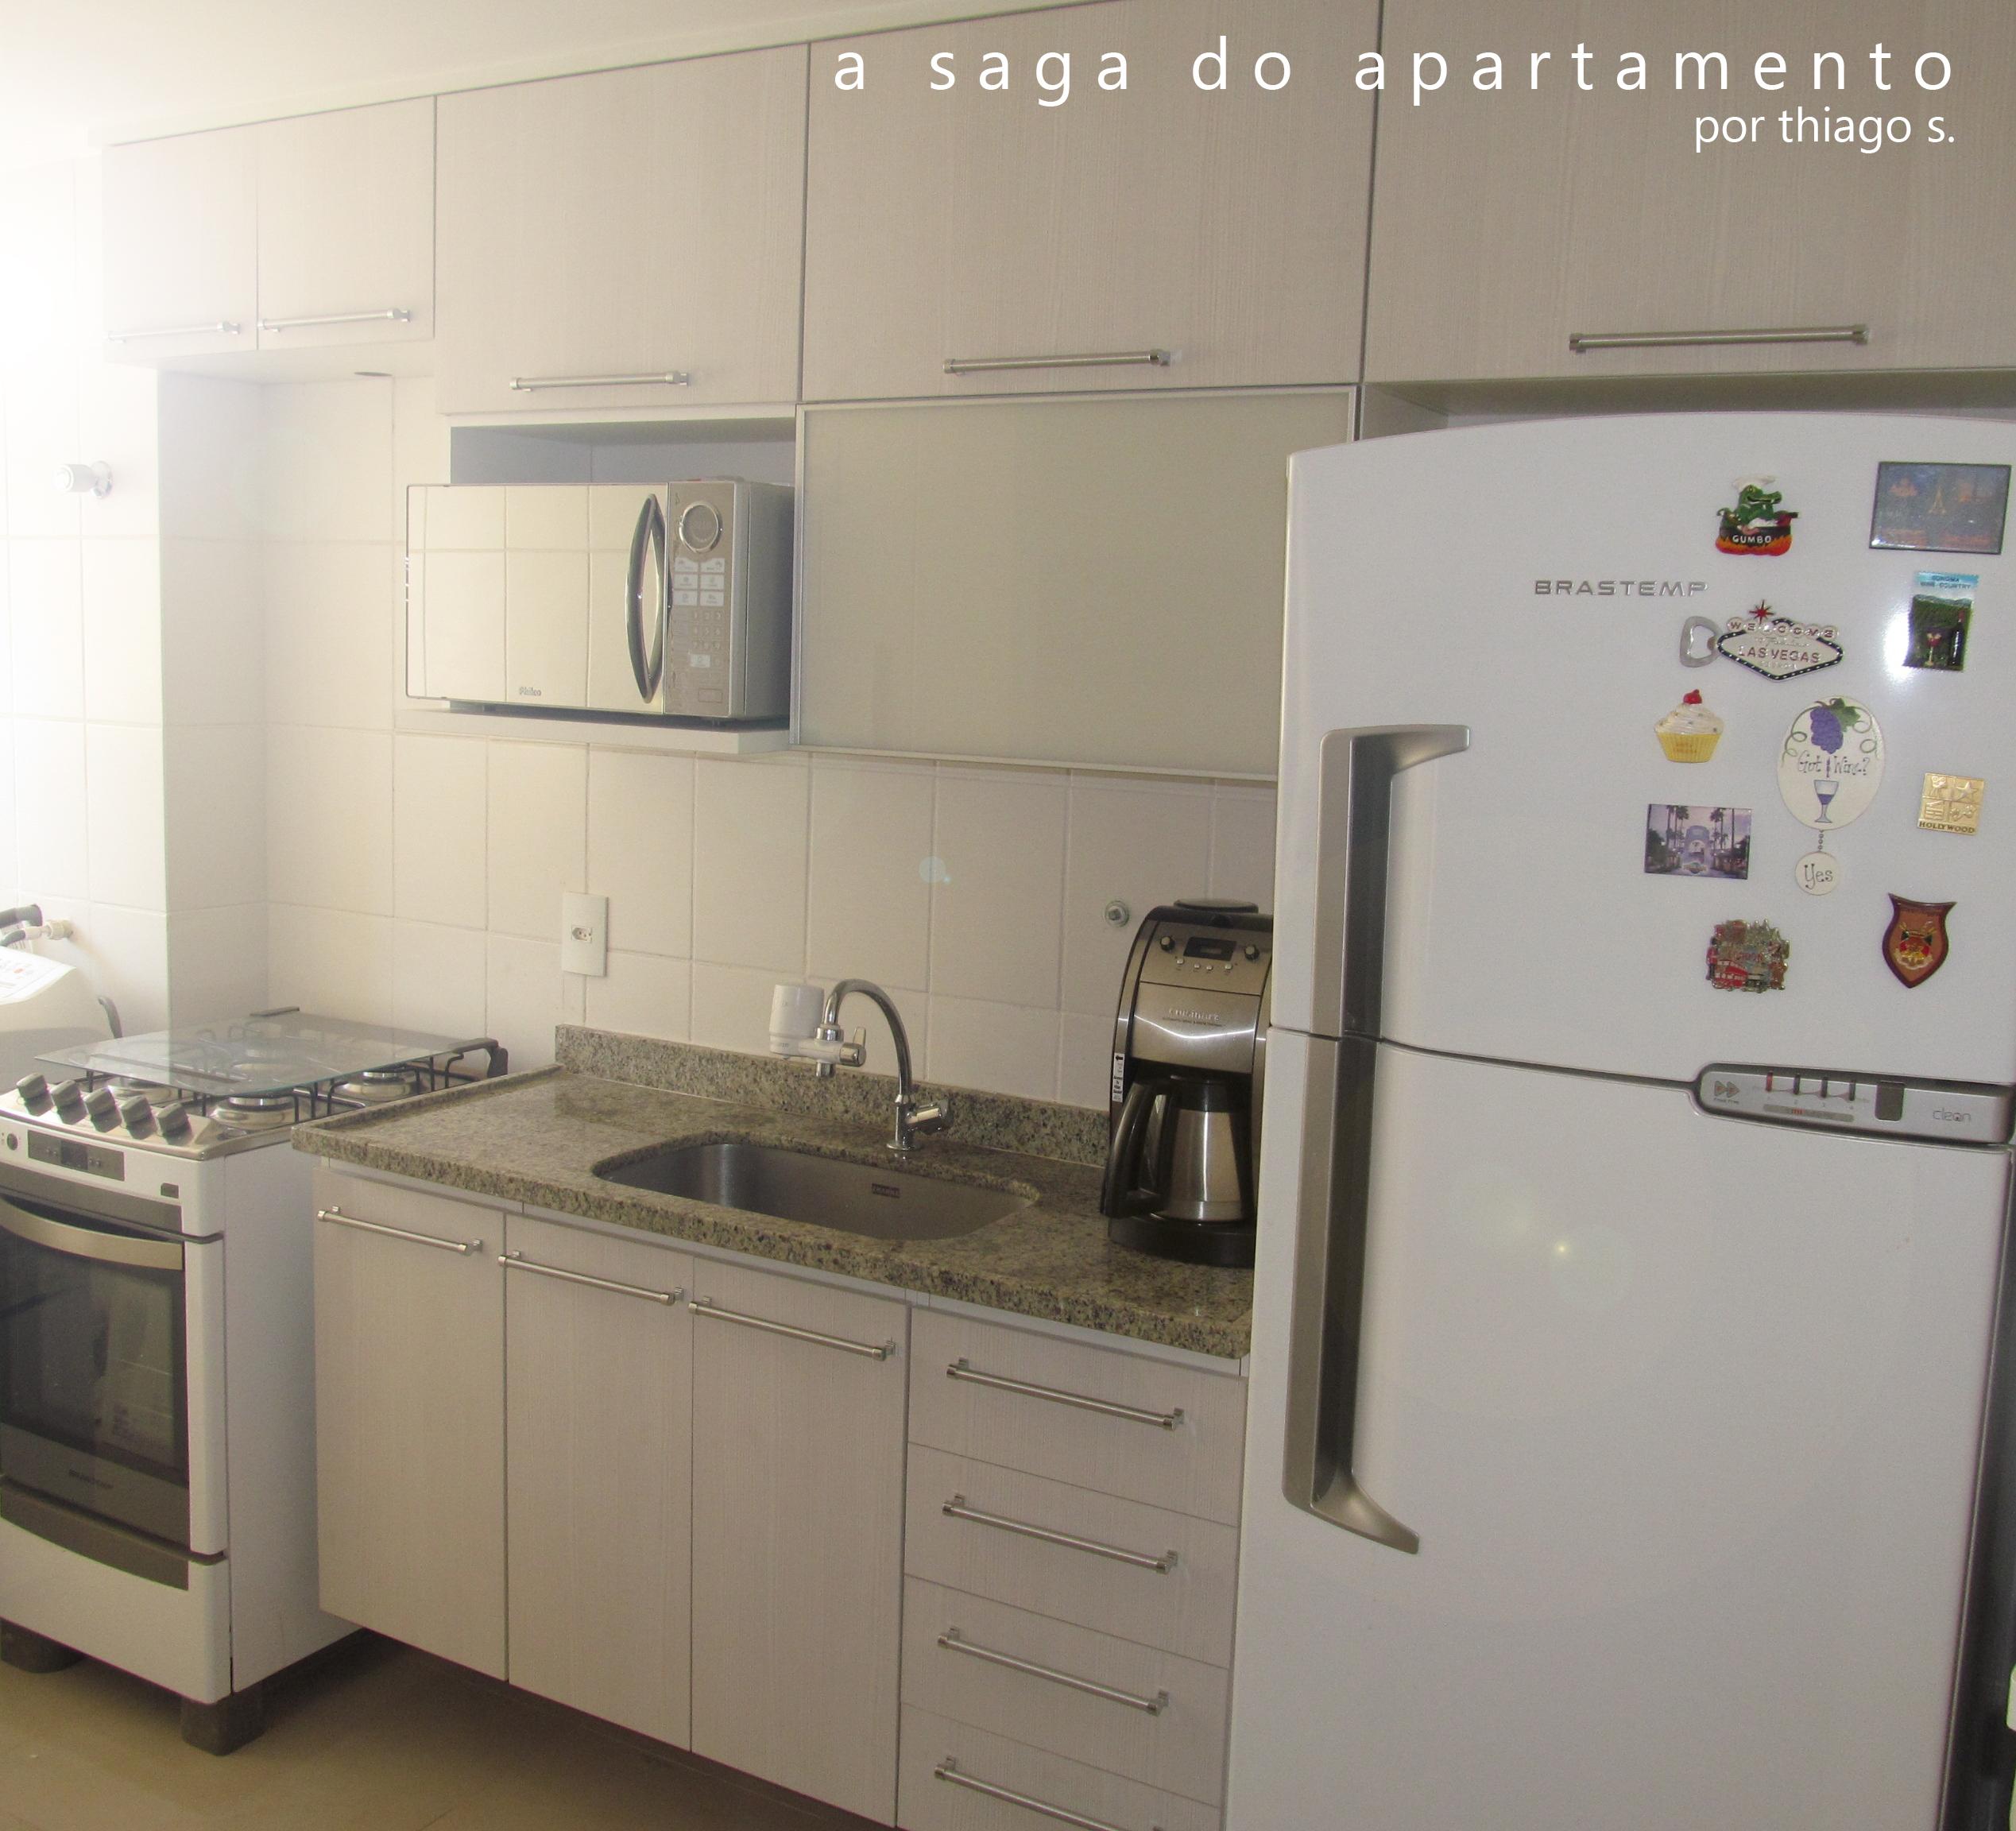 cozinha planejada bon bini cor aspen italc3adnea #5D4E3D 2537 2304